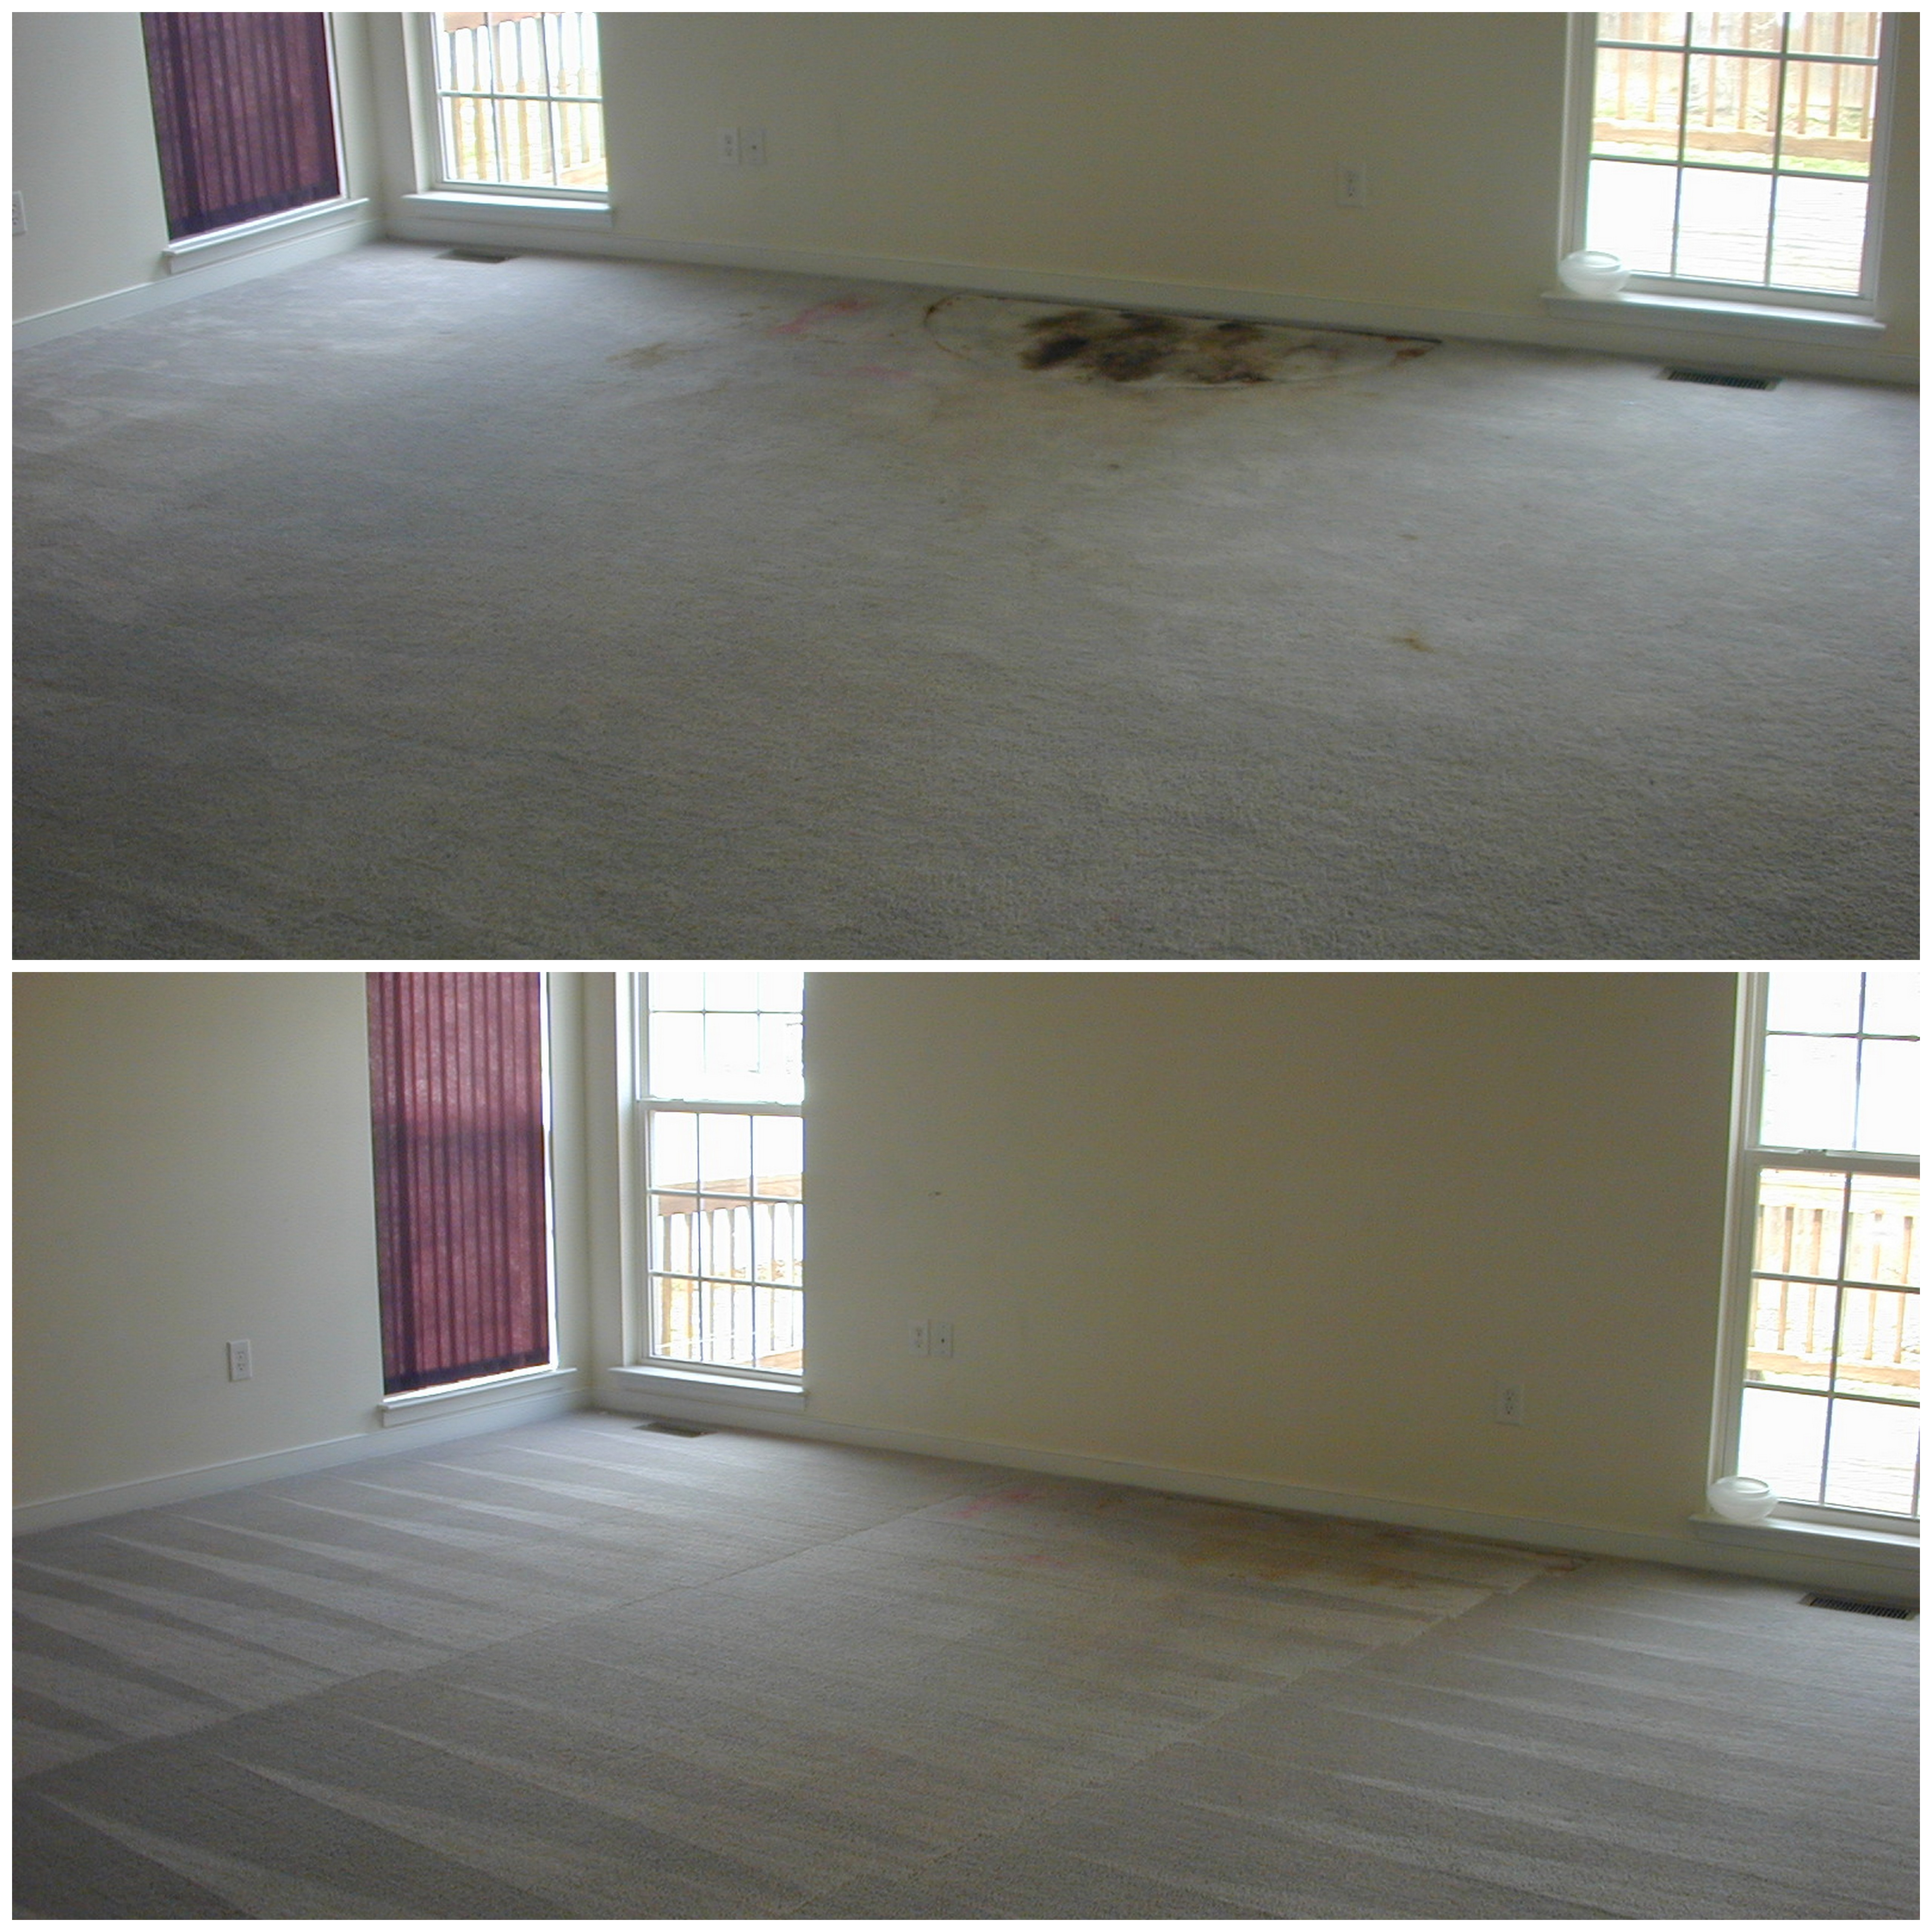 b-a-citrusolution-carpet-cleaning-gwinnett-carpet-cleaning